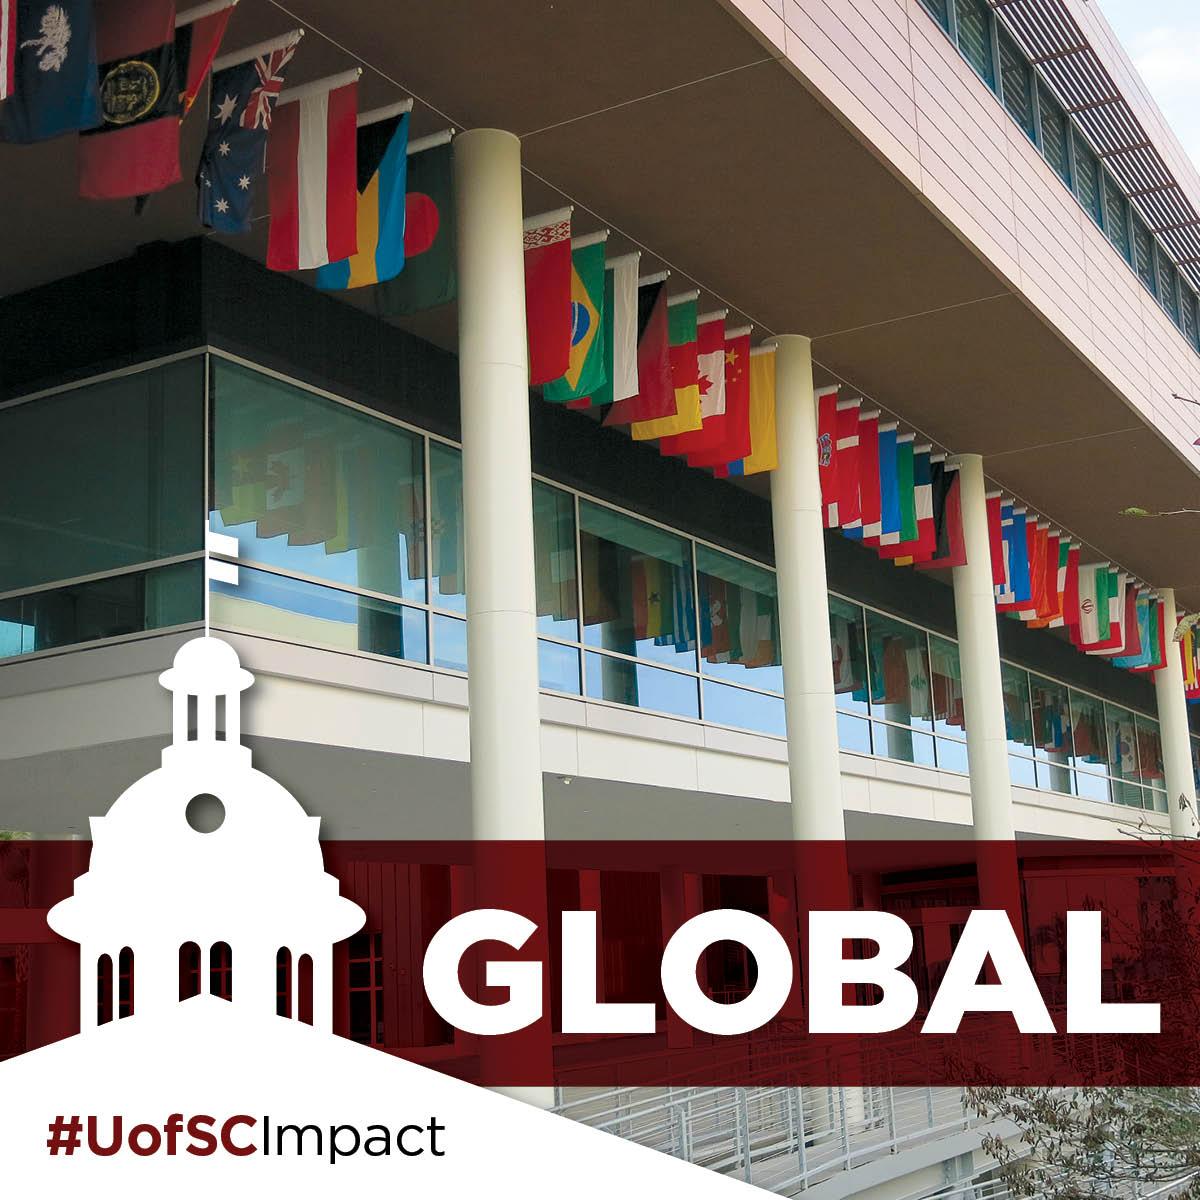 international flags #UofSCImpact